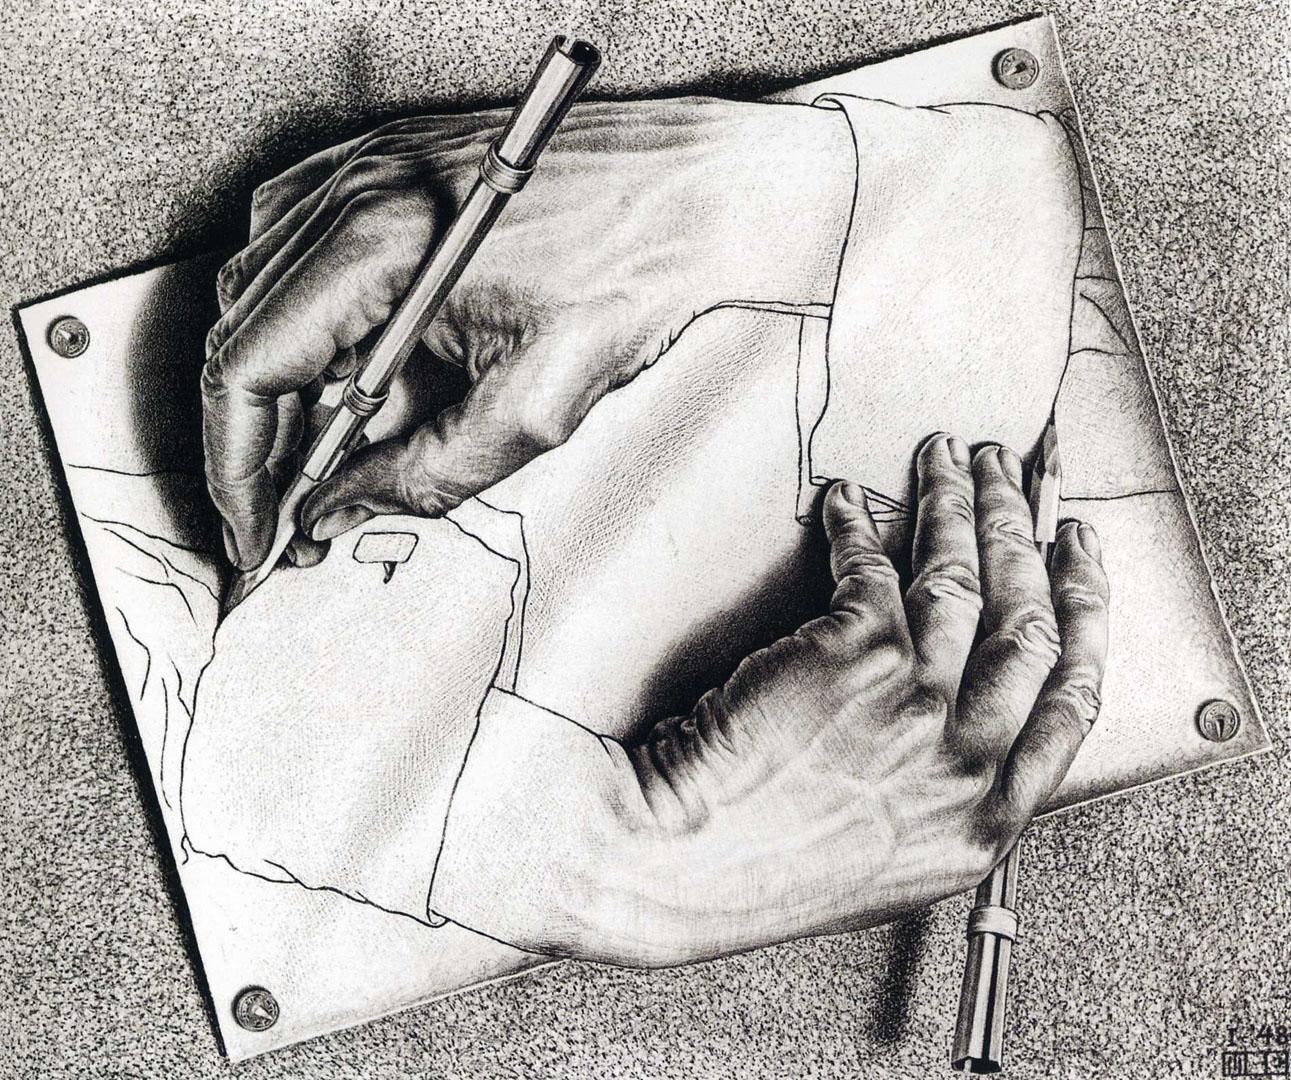 Drawn optical illusion wallpaper Illusions Drawings wallpaper Illusions Drawings